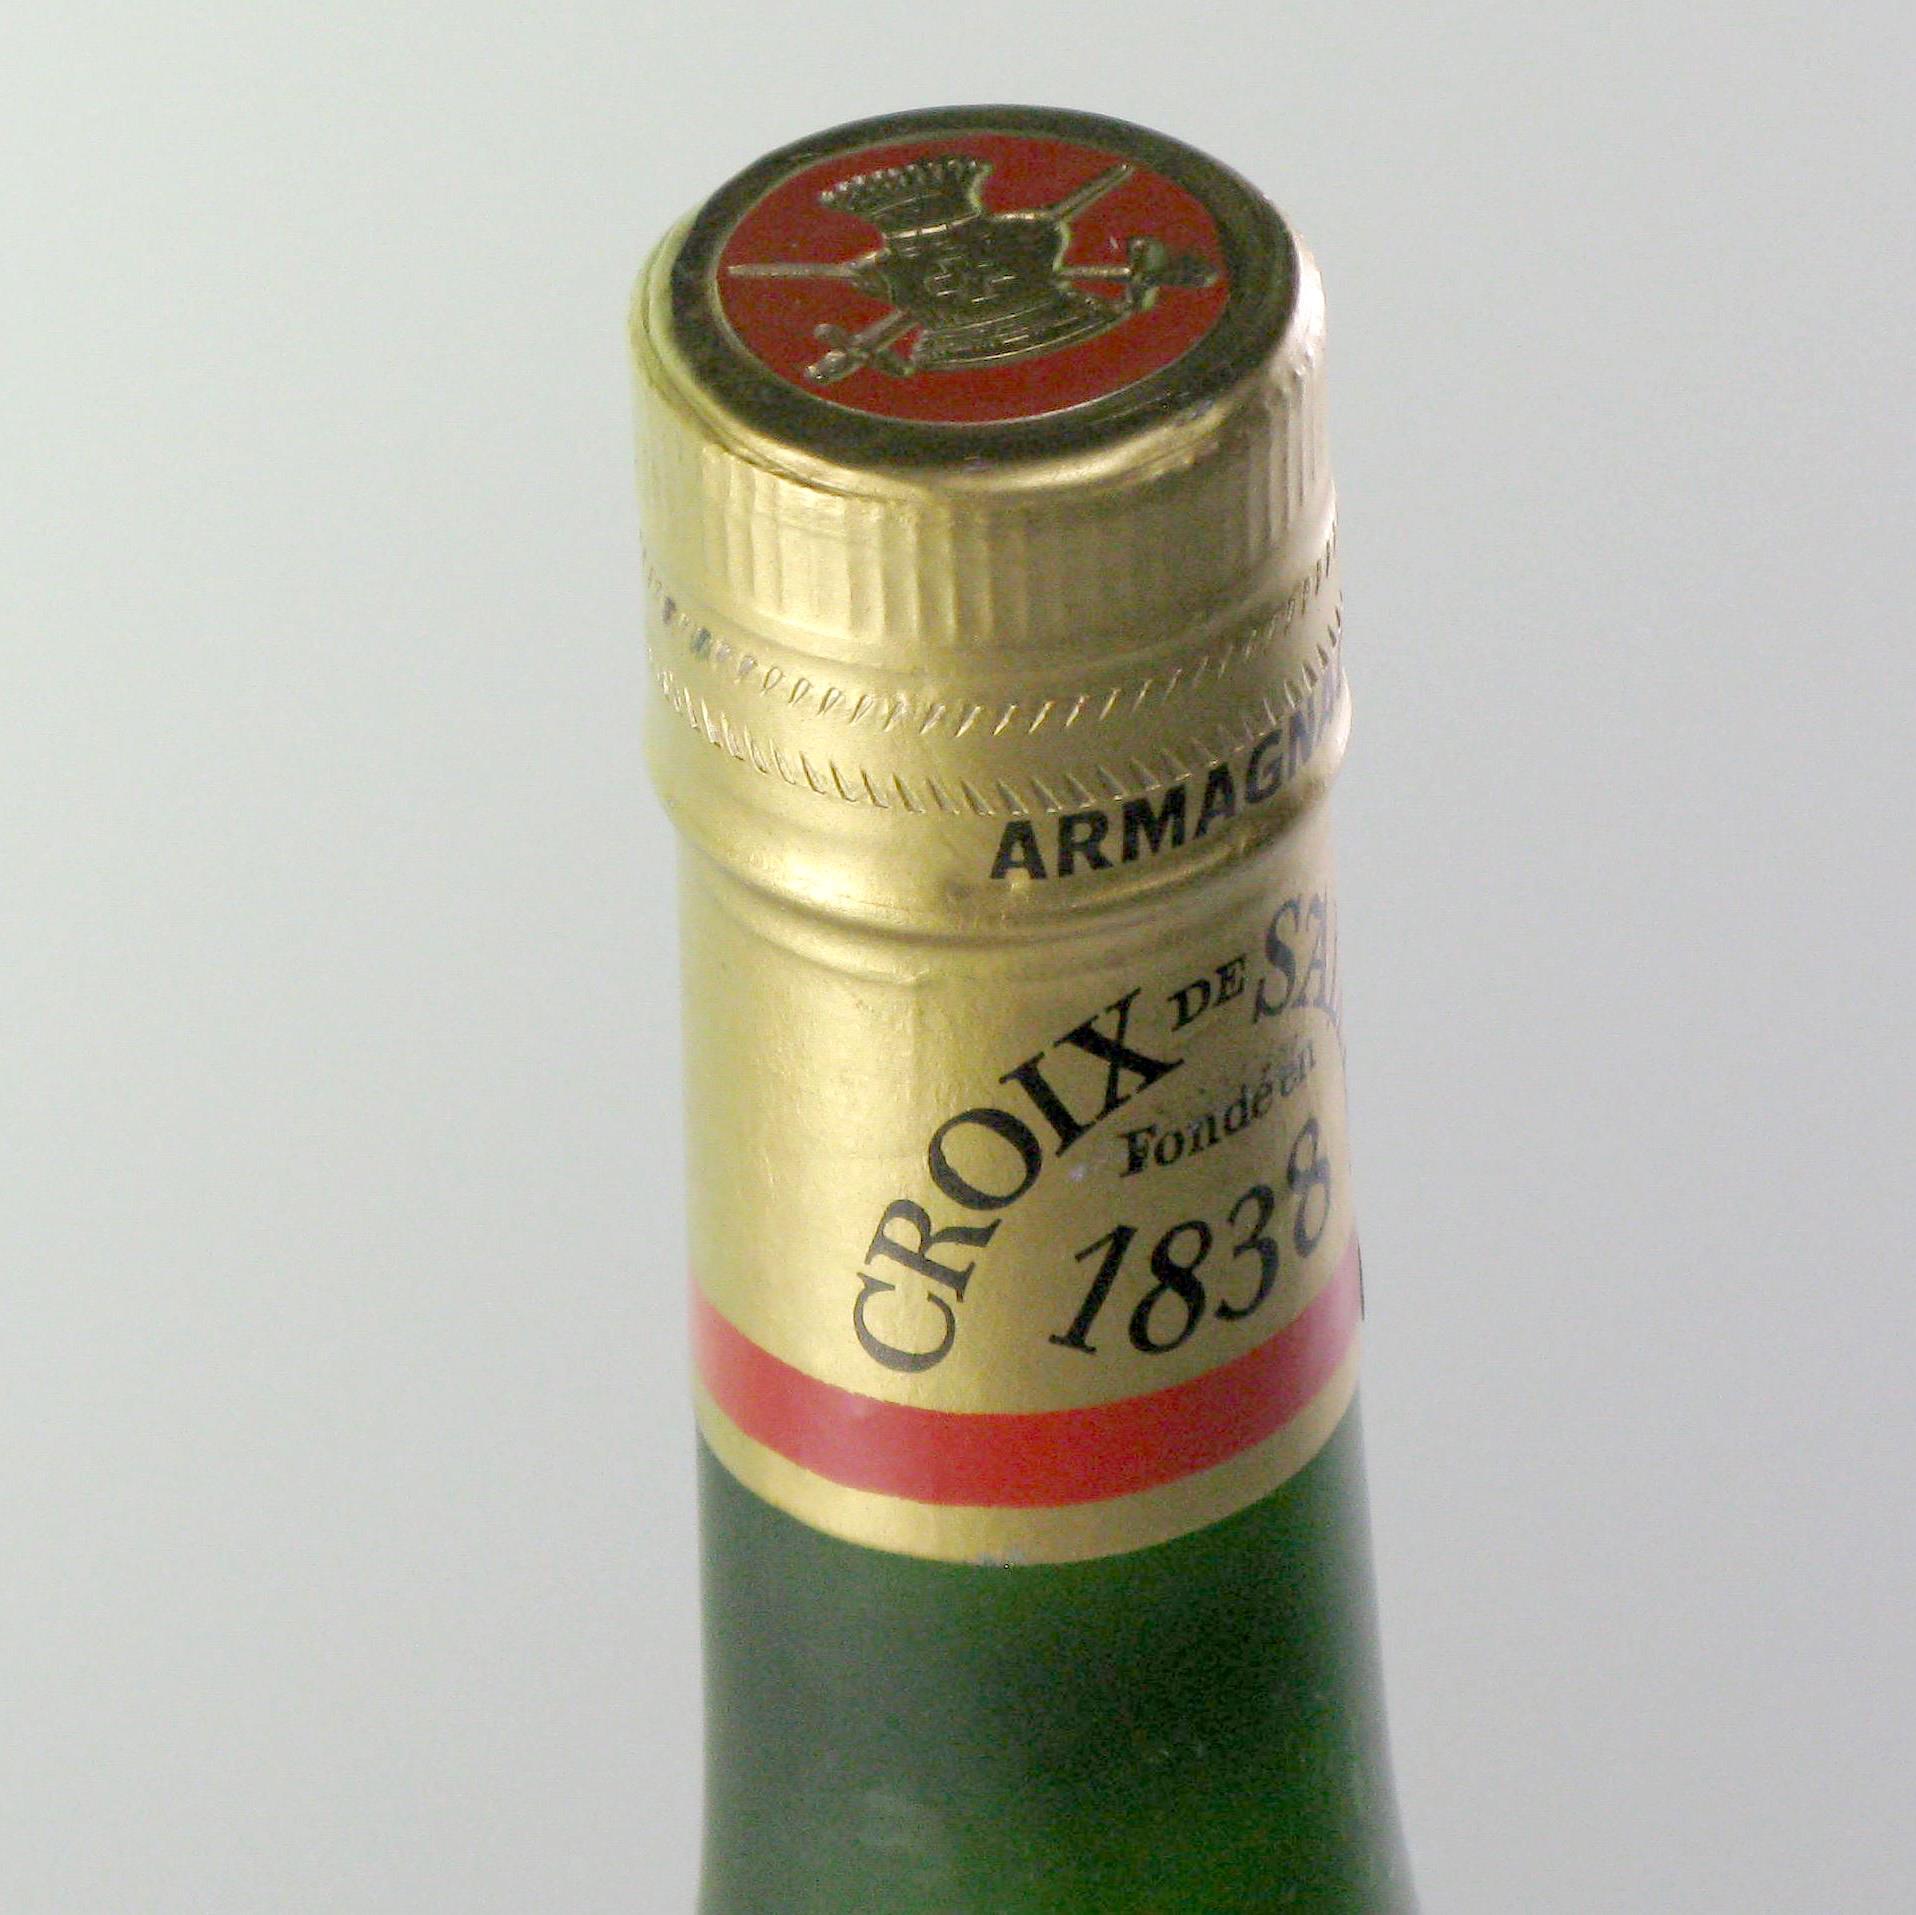 Armagnac 1906 Croix de Salles